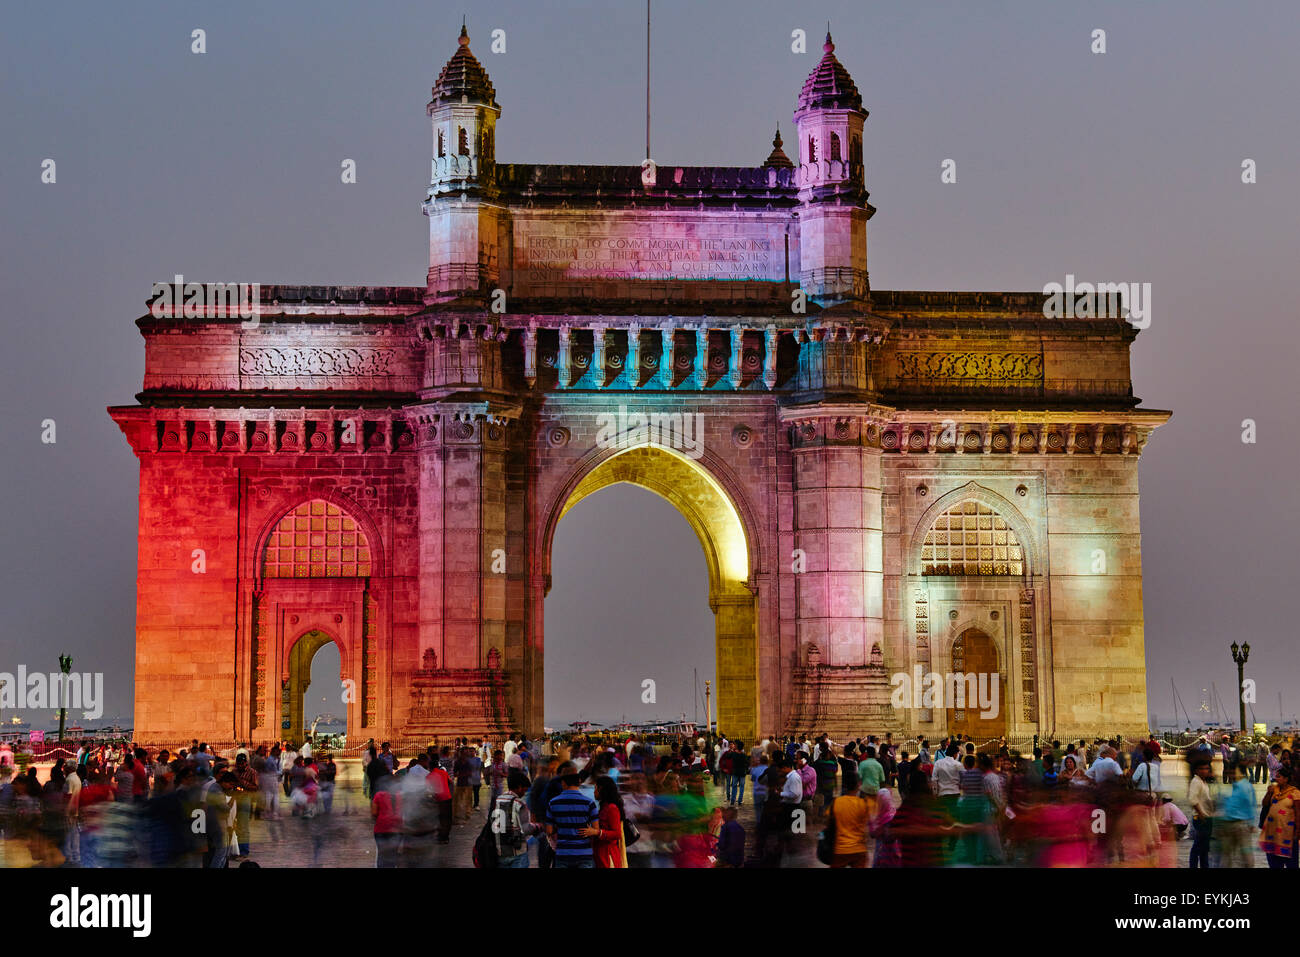 L'Inde, Maharashtra, Mumbai (Bombay), porte de l'Inde Photo Stock